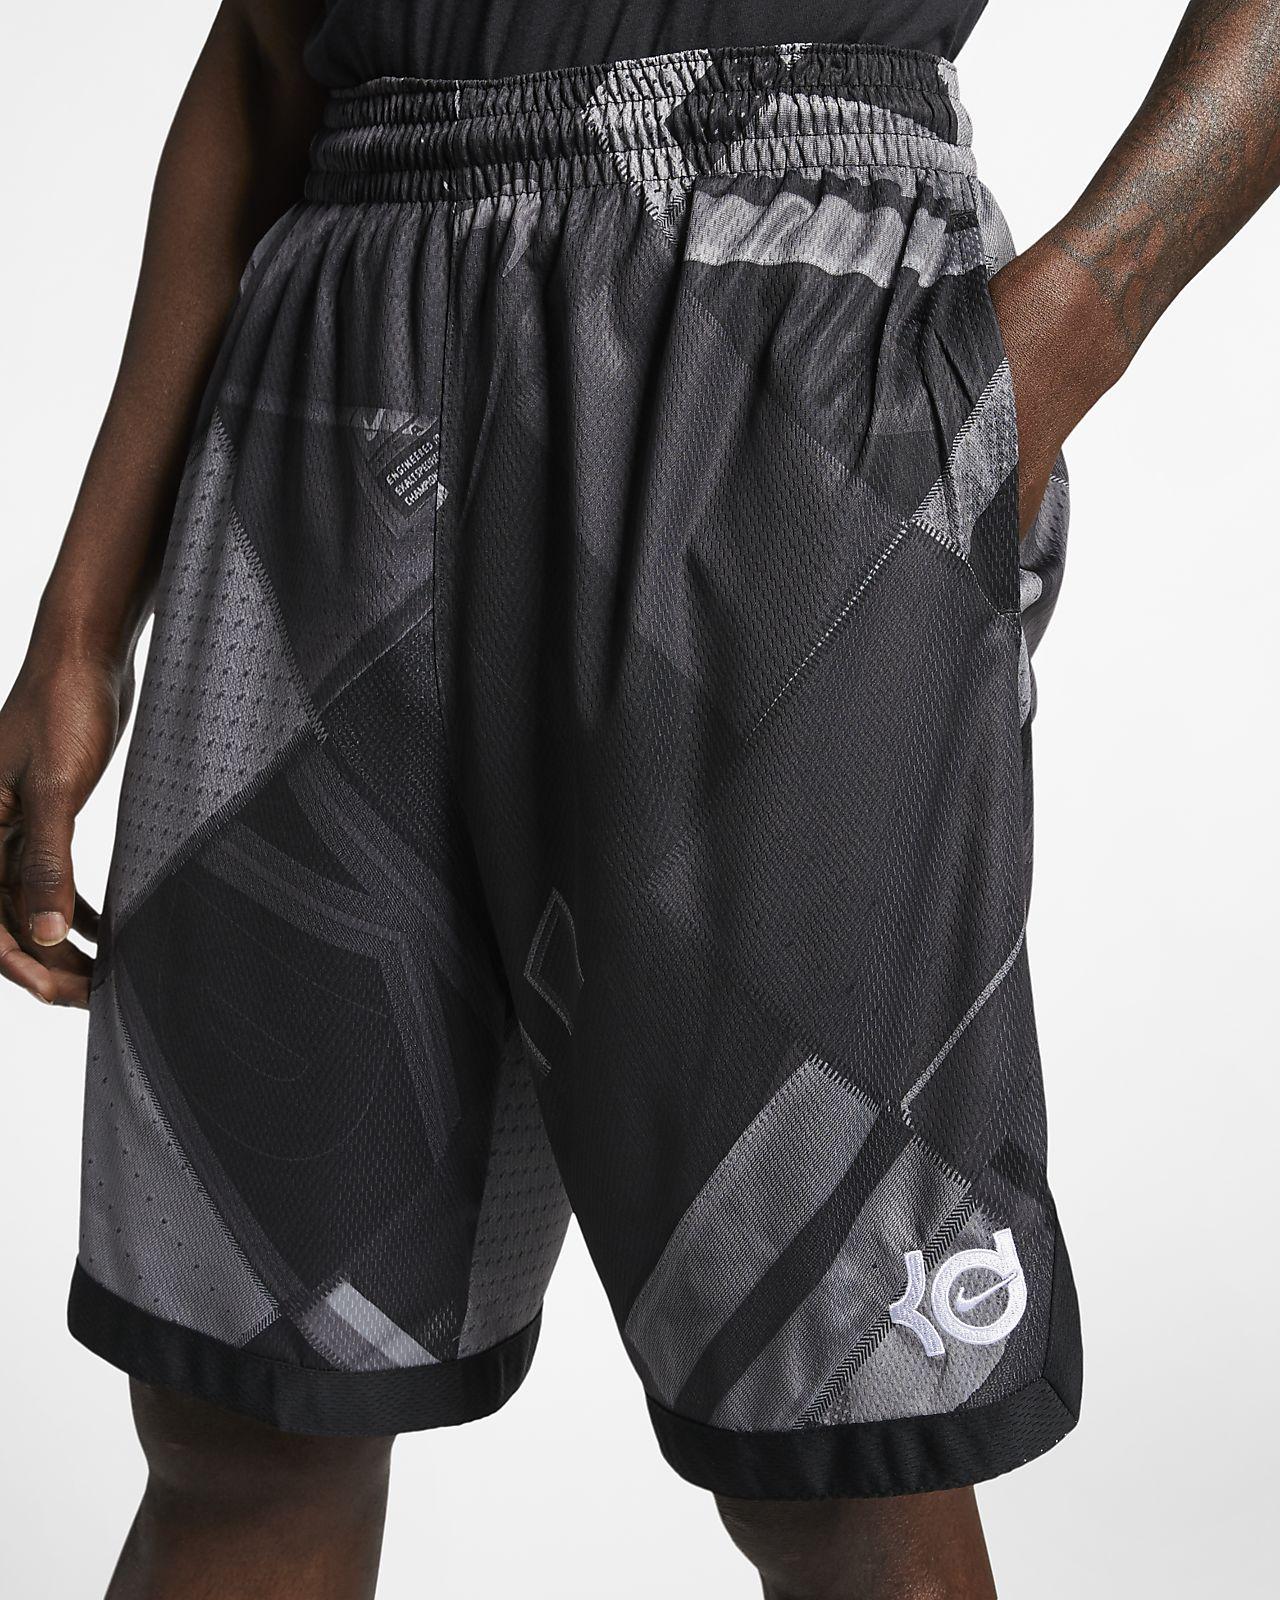 218703613abb0 Shorts de básquetbol para hombre KD. Nike.com CL